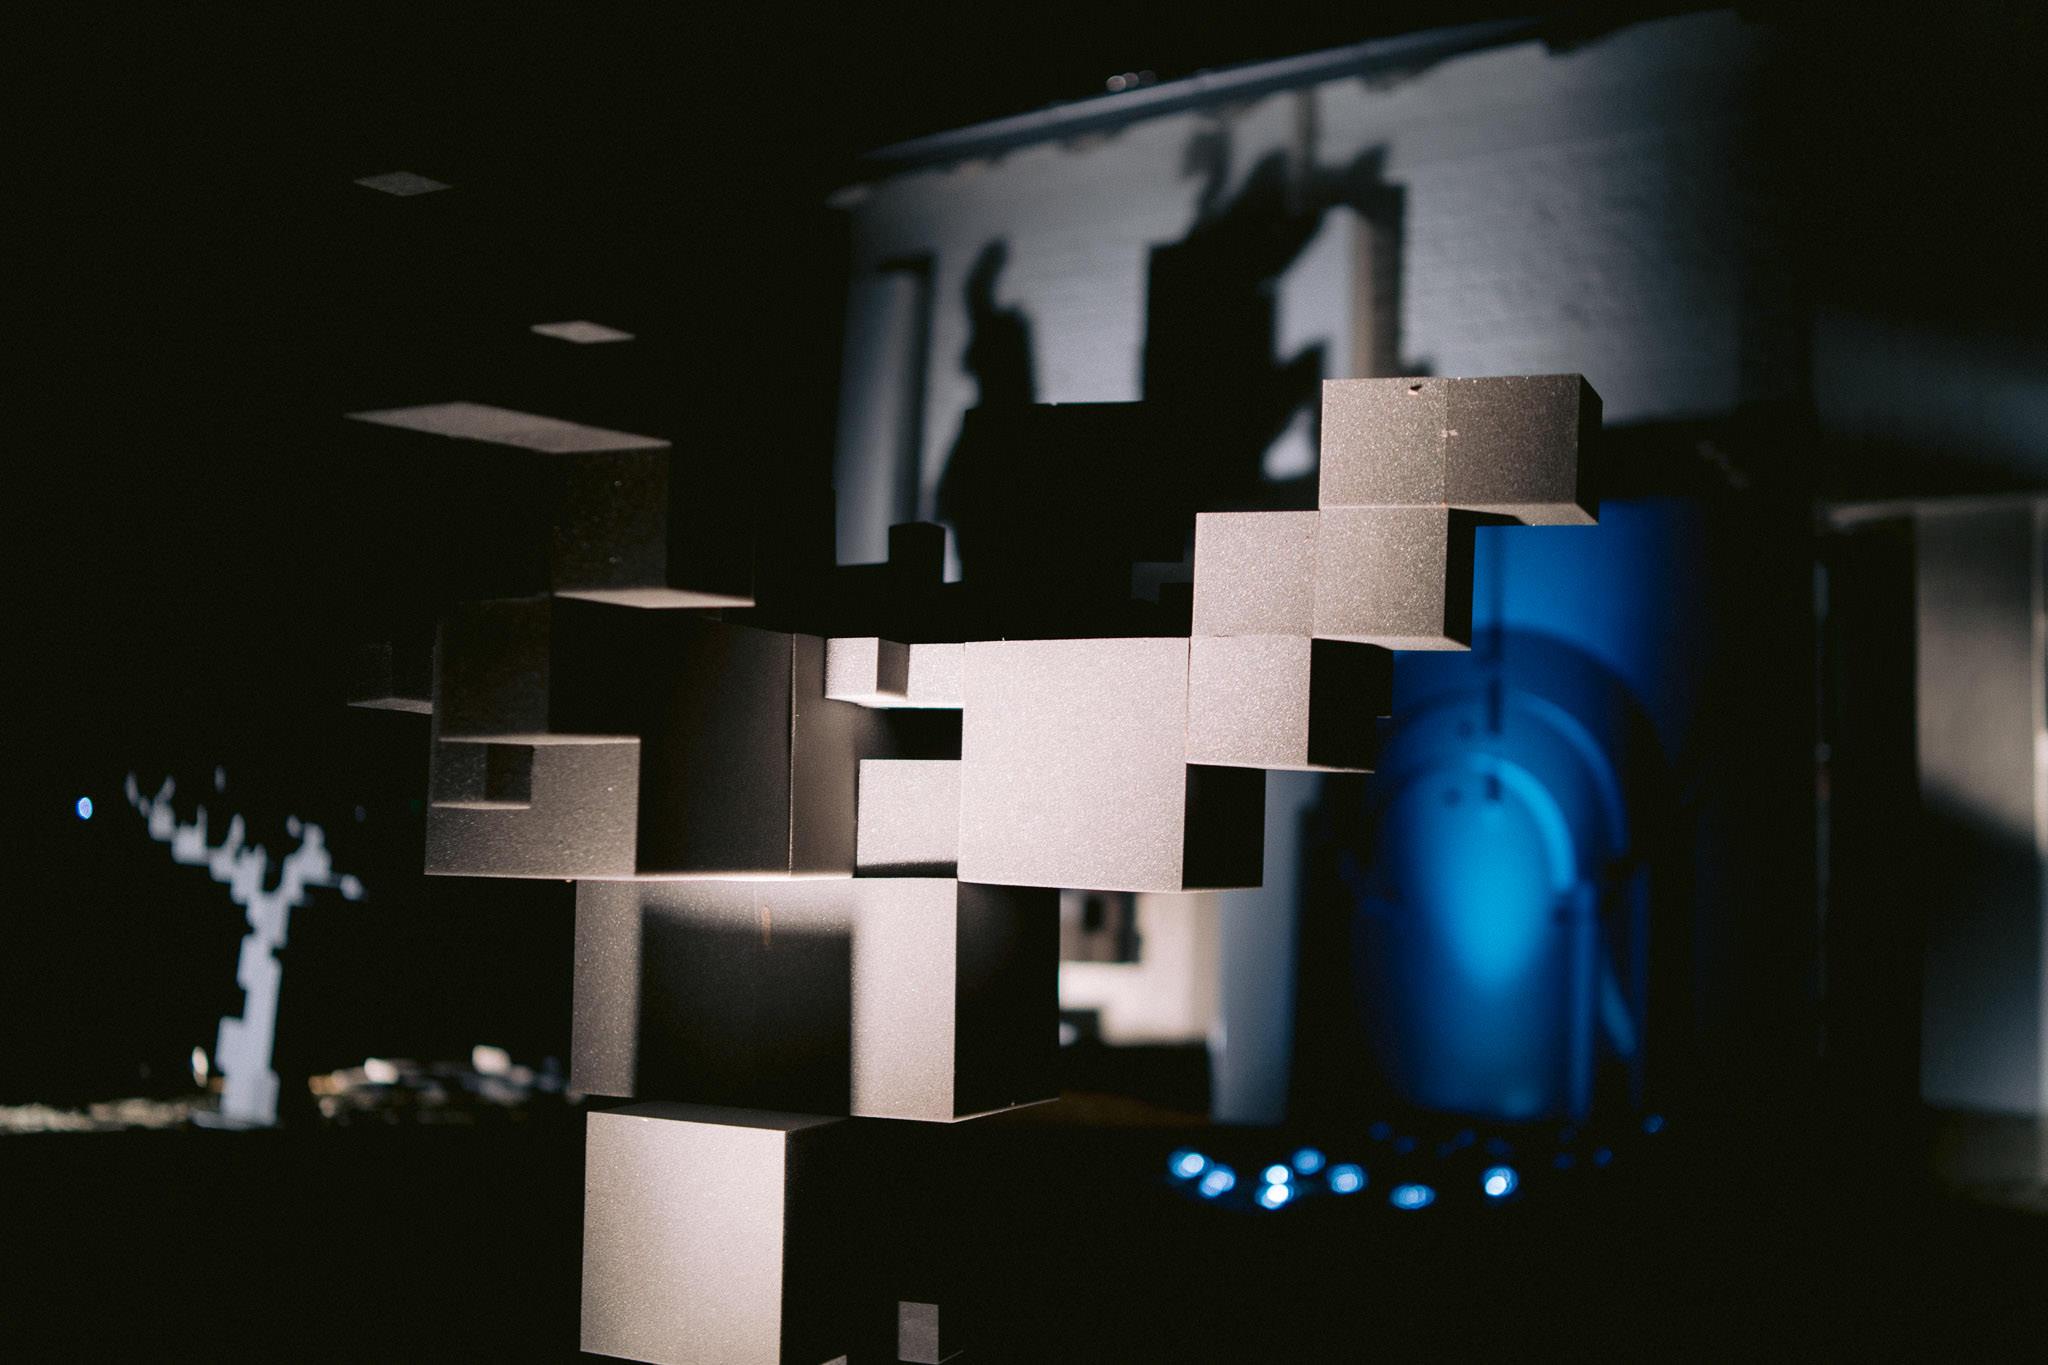 Kaleidoskop kulture Ars elektronika